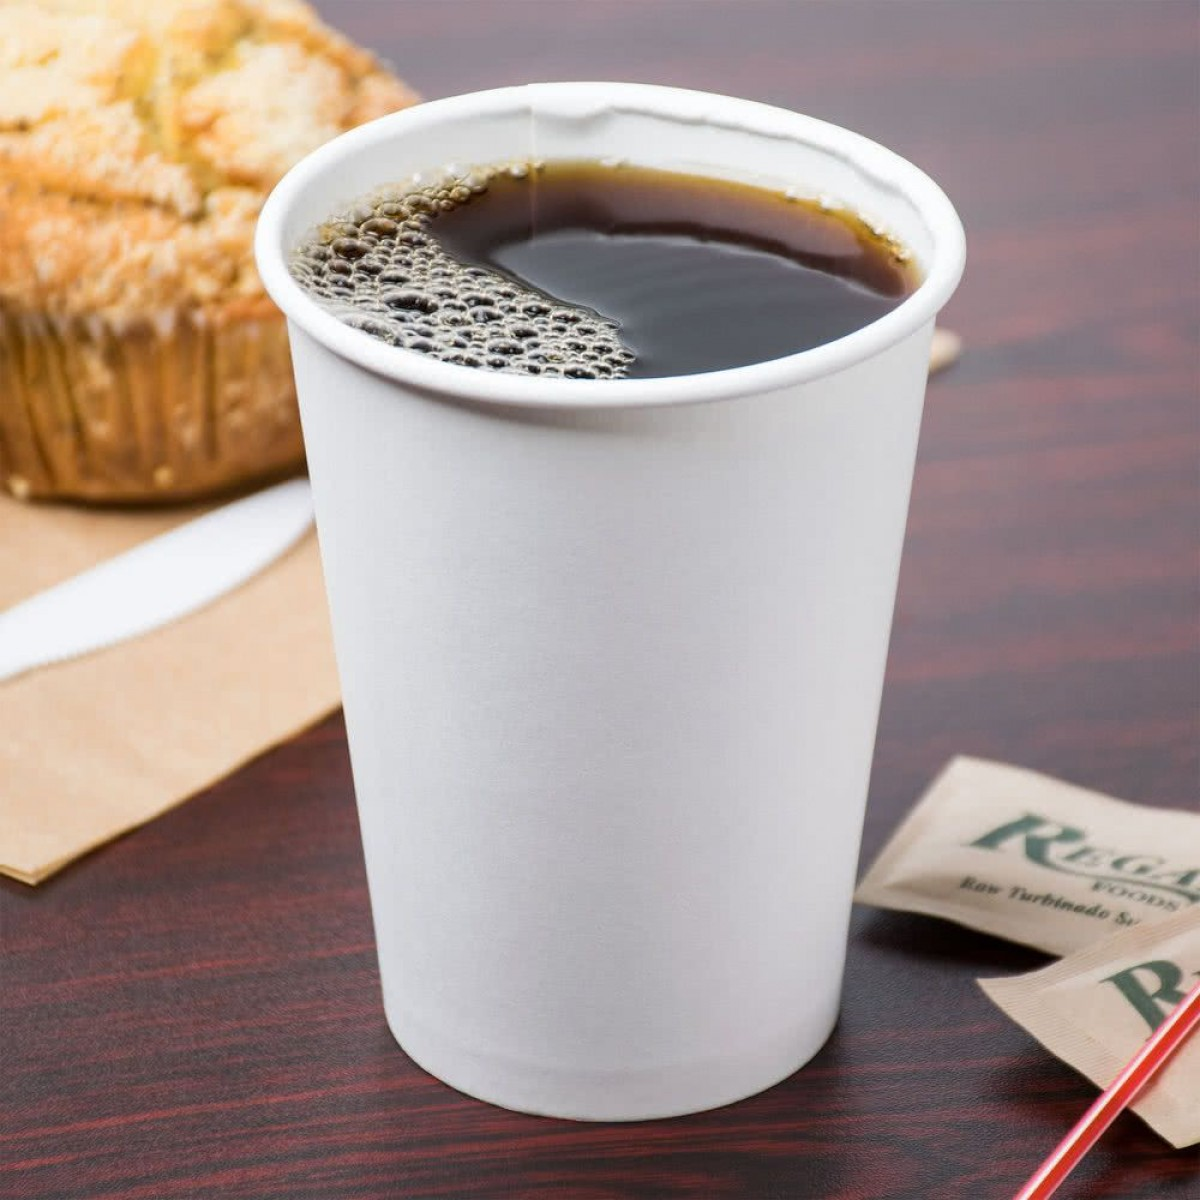 POLYCOFFEE - AMERICANO - Order JER